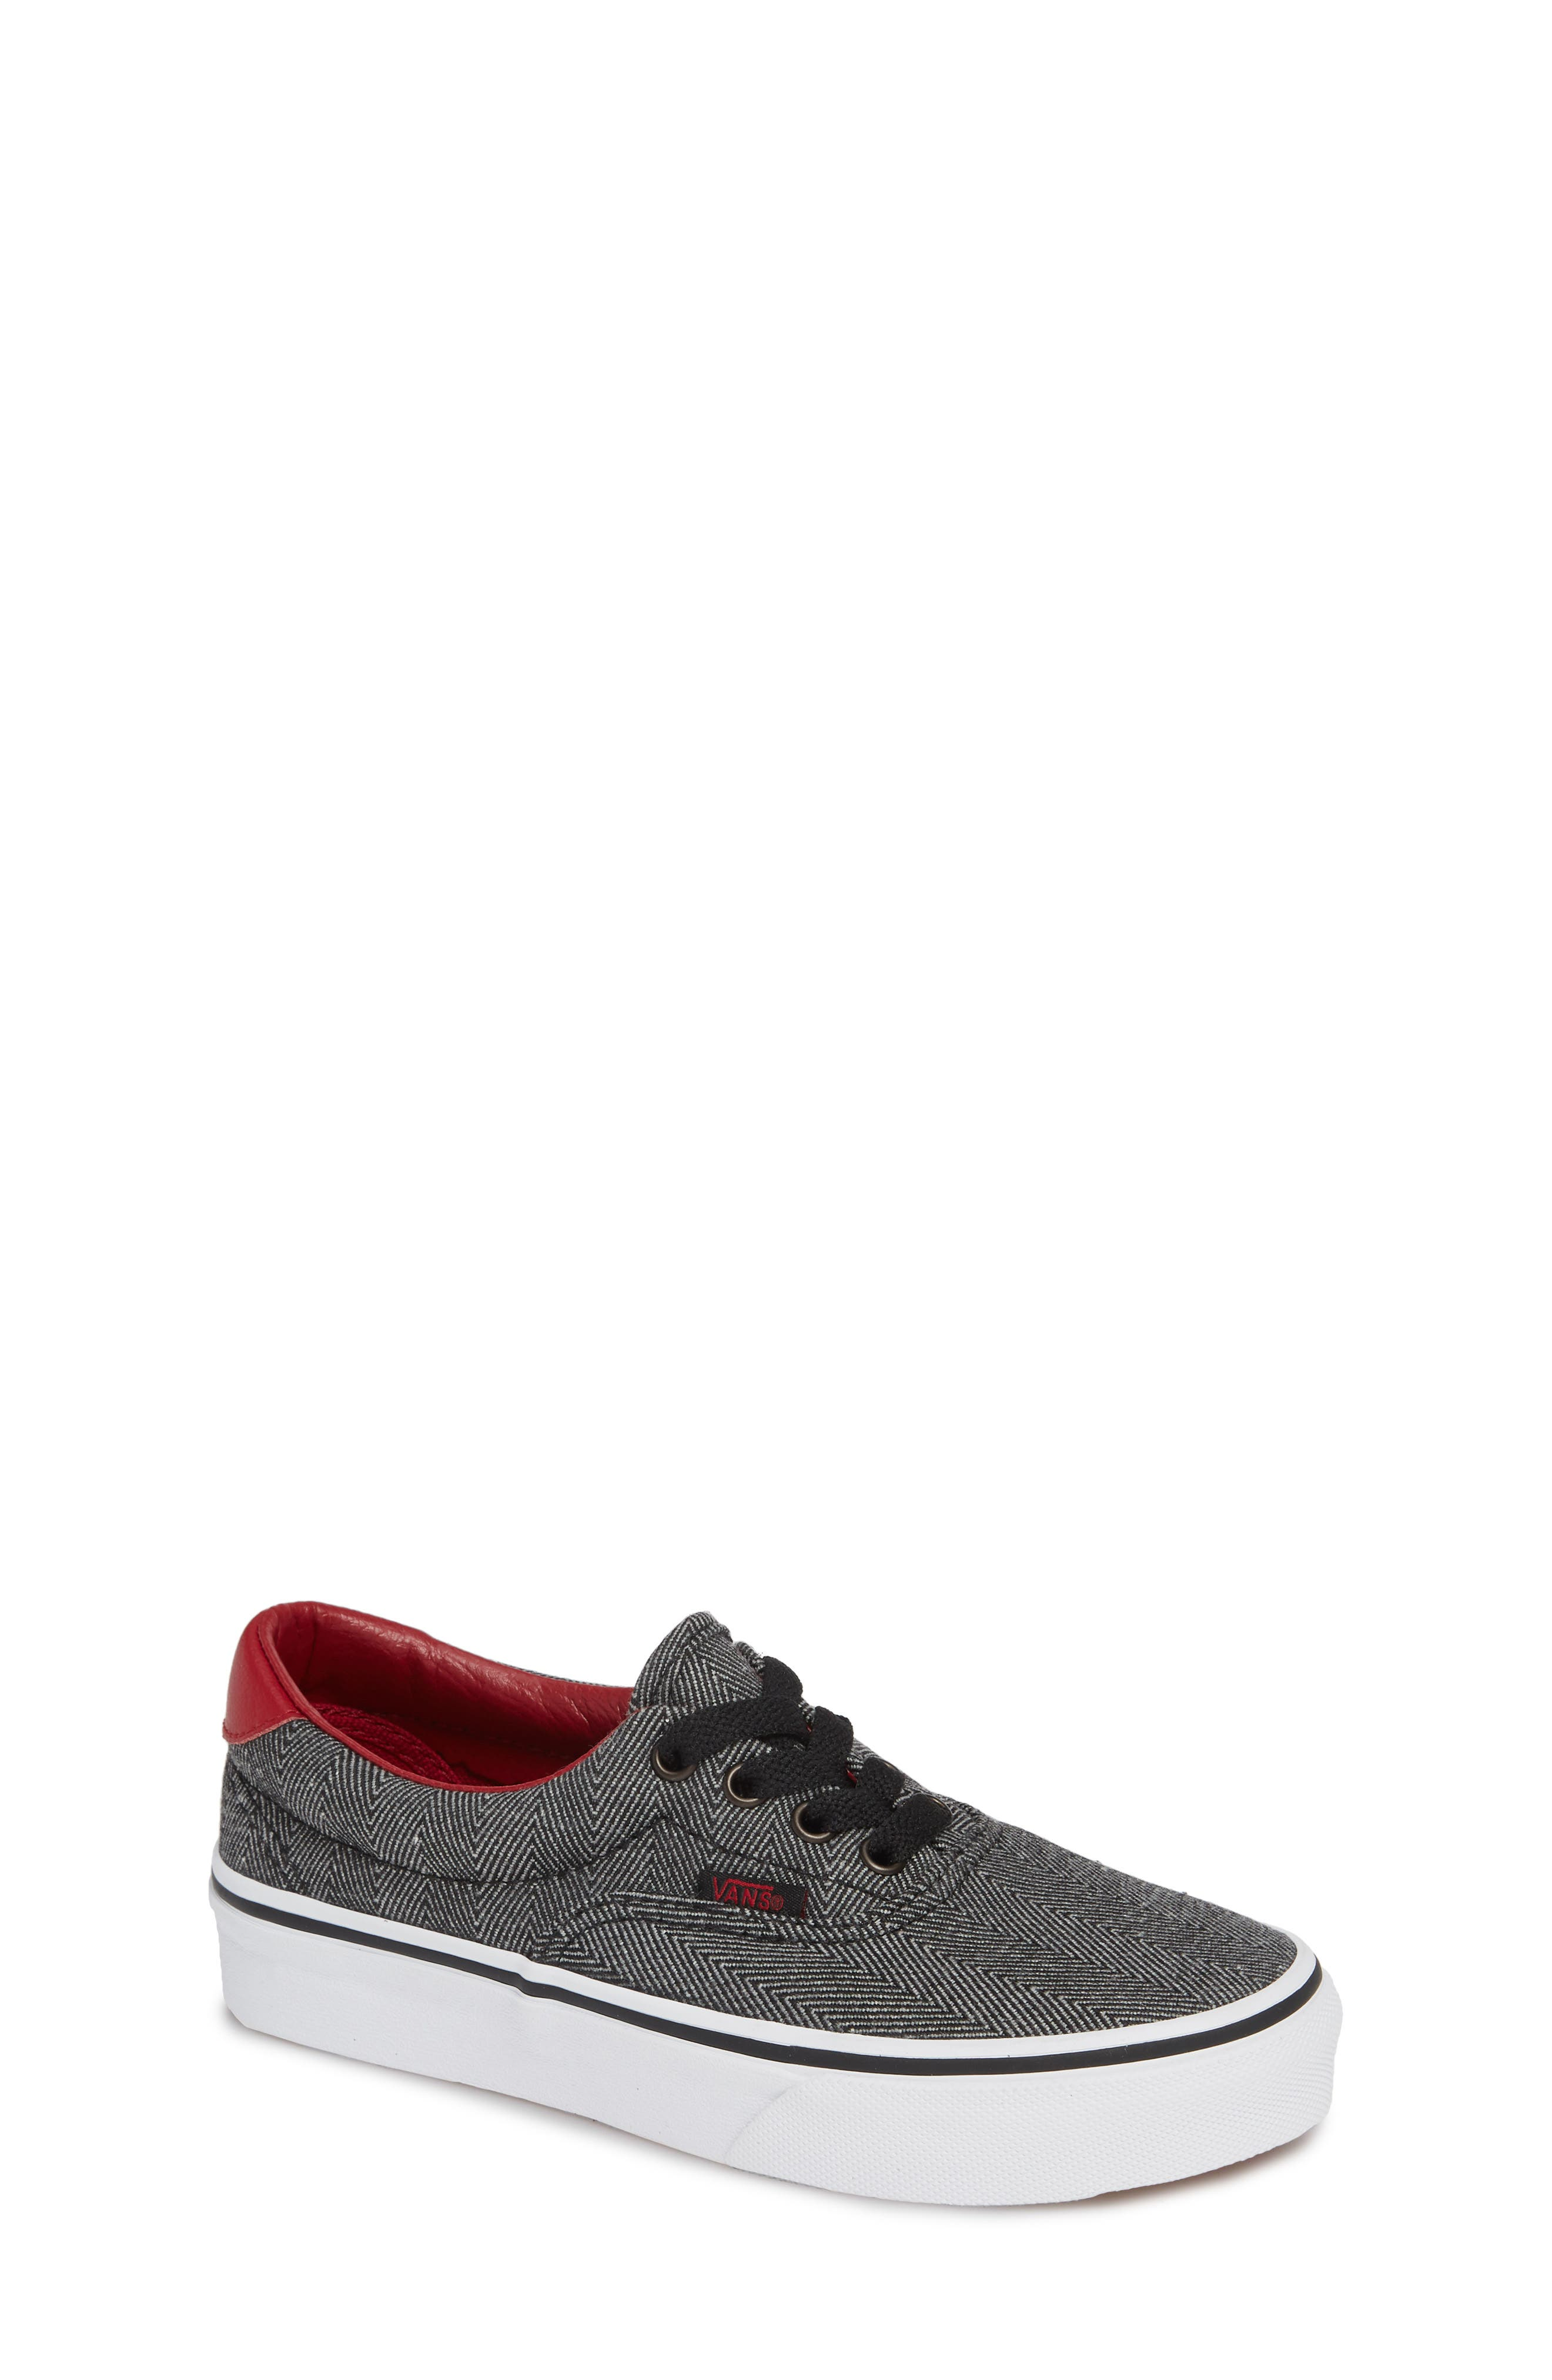 Era 59 Bleacher Sneaker,                             Main thumbnail 1, color,                             002